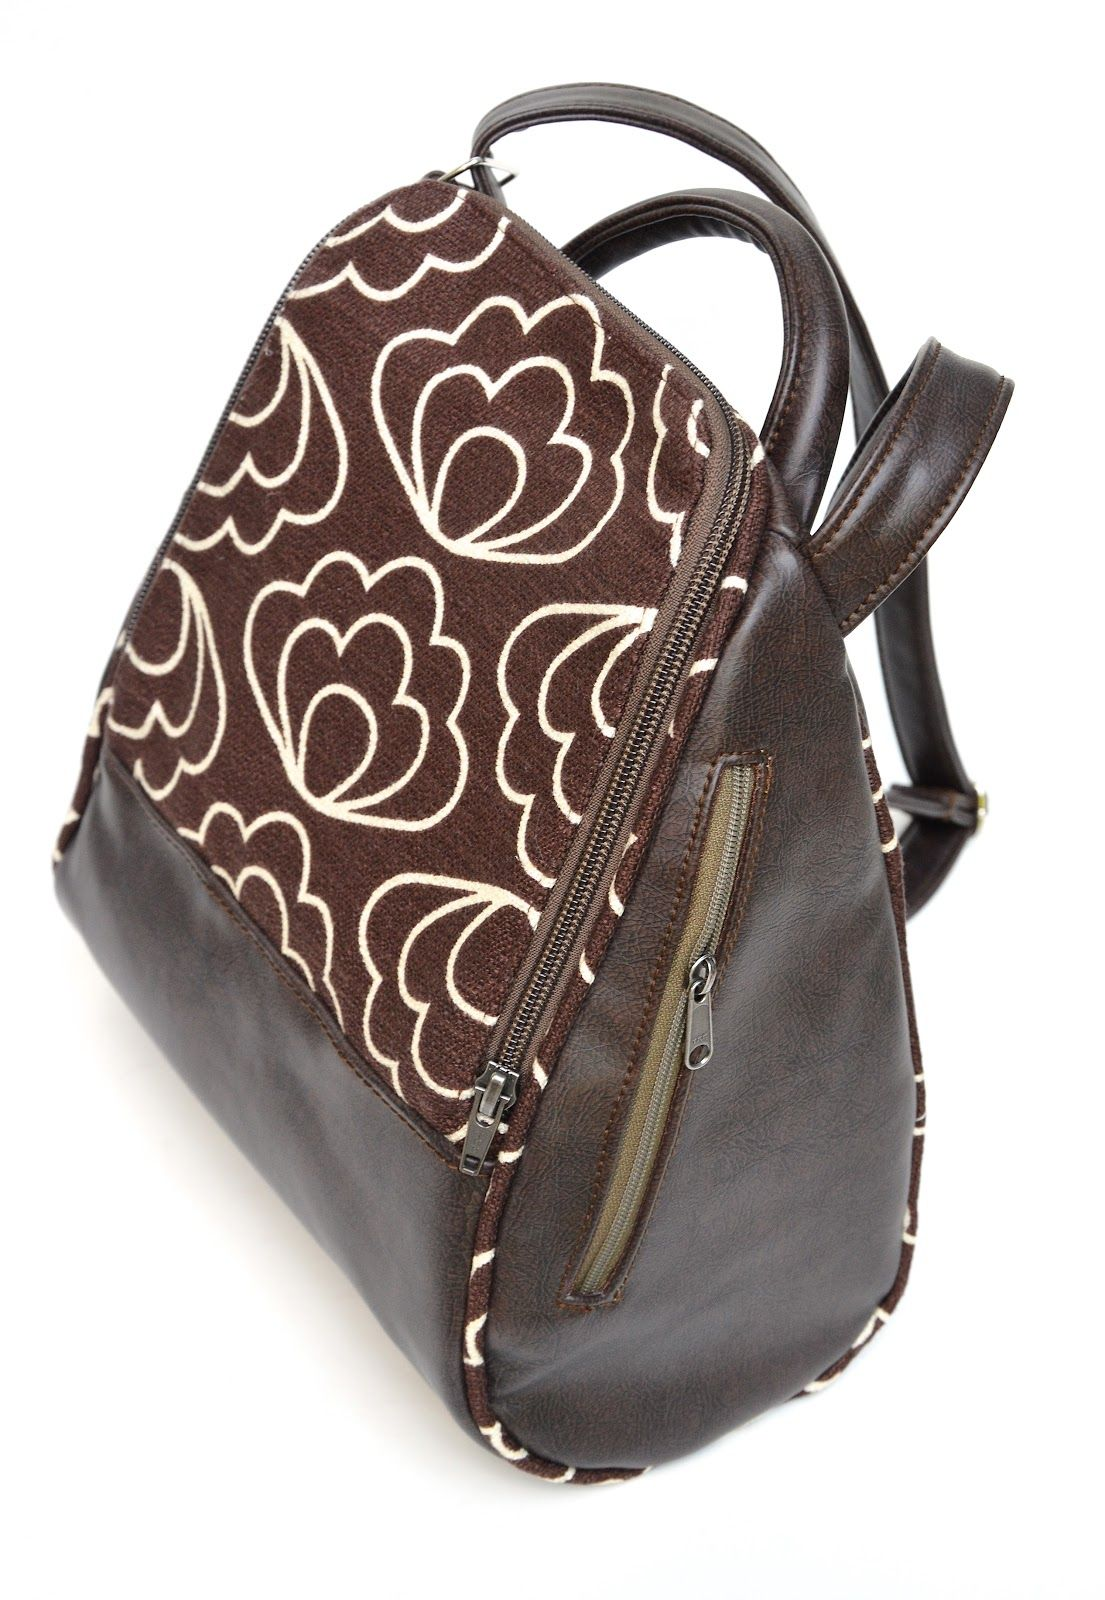 Bag sewn by LiEr of Ikat Bag using vinyl and Time Warp barkcloth by ...